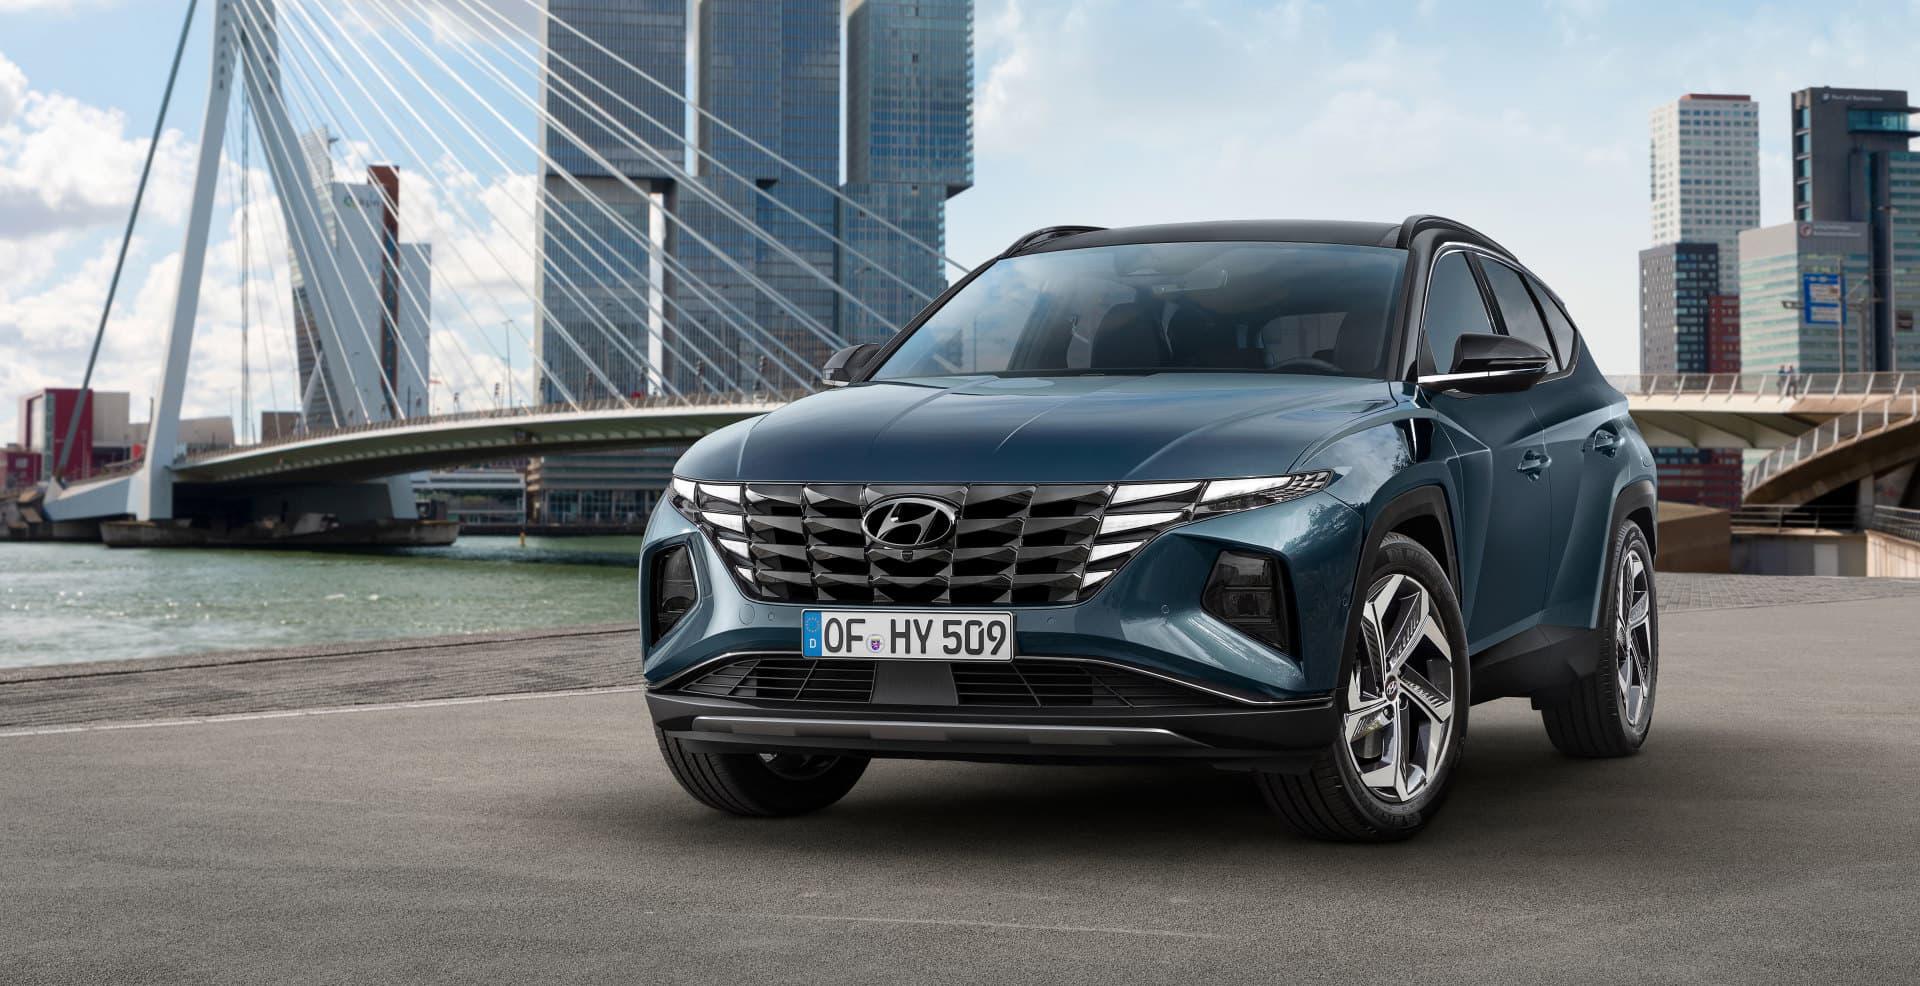 Hyundai Tucson 2021 Exterior 01 Portada